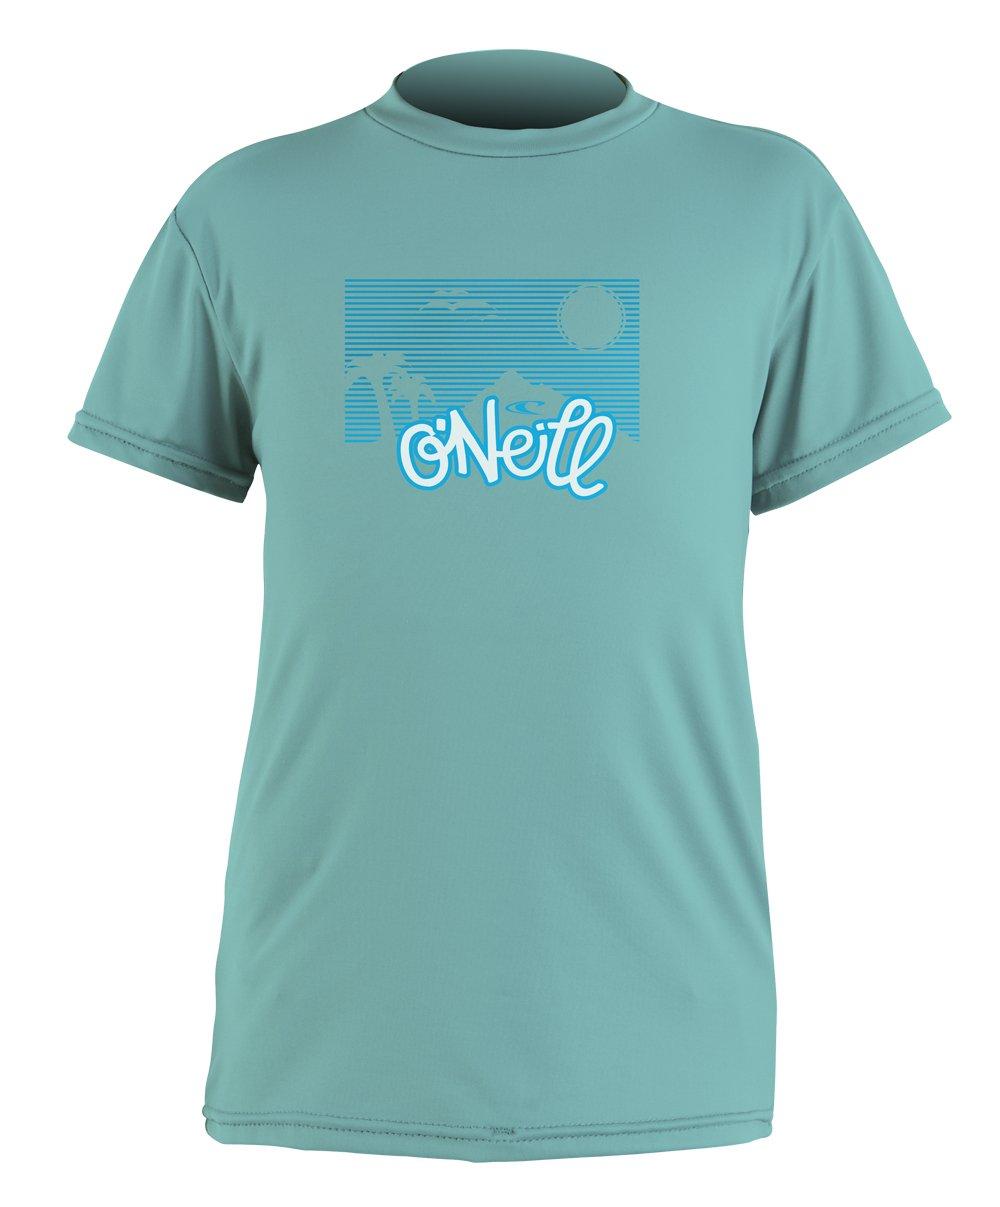 O'Neill Wetsuits Girl's Toddler Skins Short Sleeve Rash Guard T-Shirt, Spy Glass Green, 2